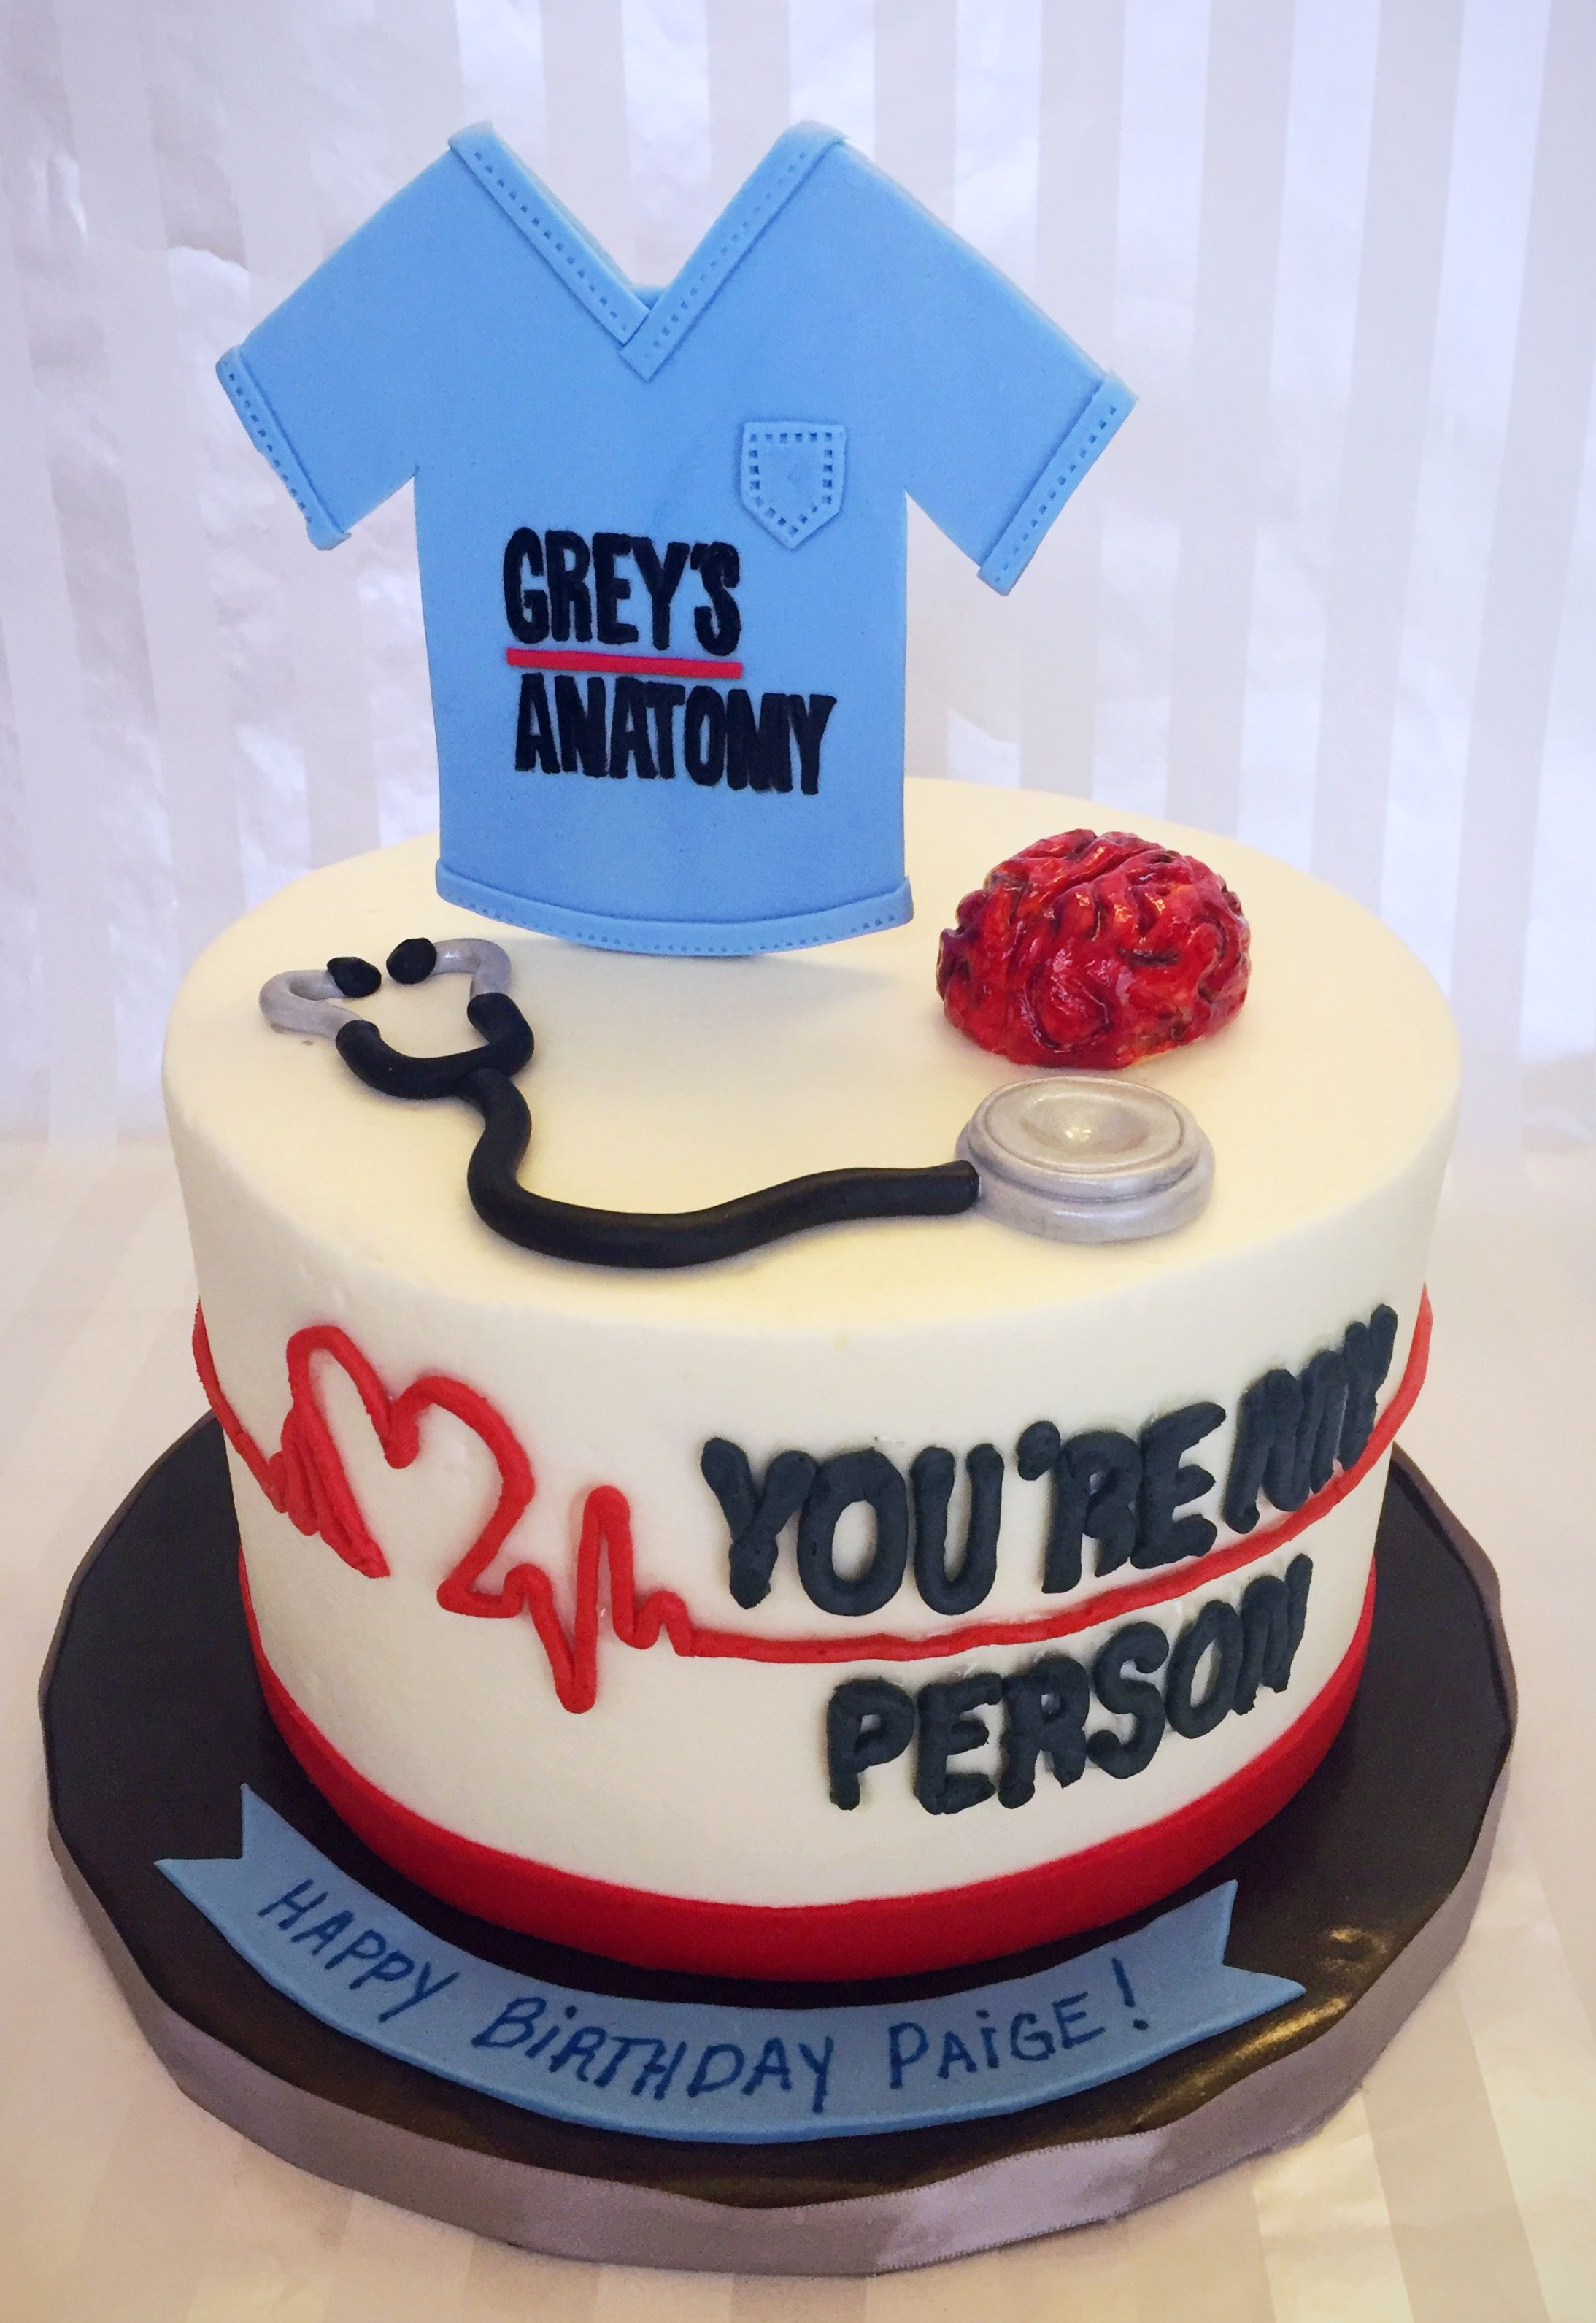 Greys Anatomy Birthday Cake Diy 21st Birthday Party Ideas Grays